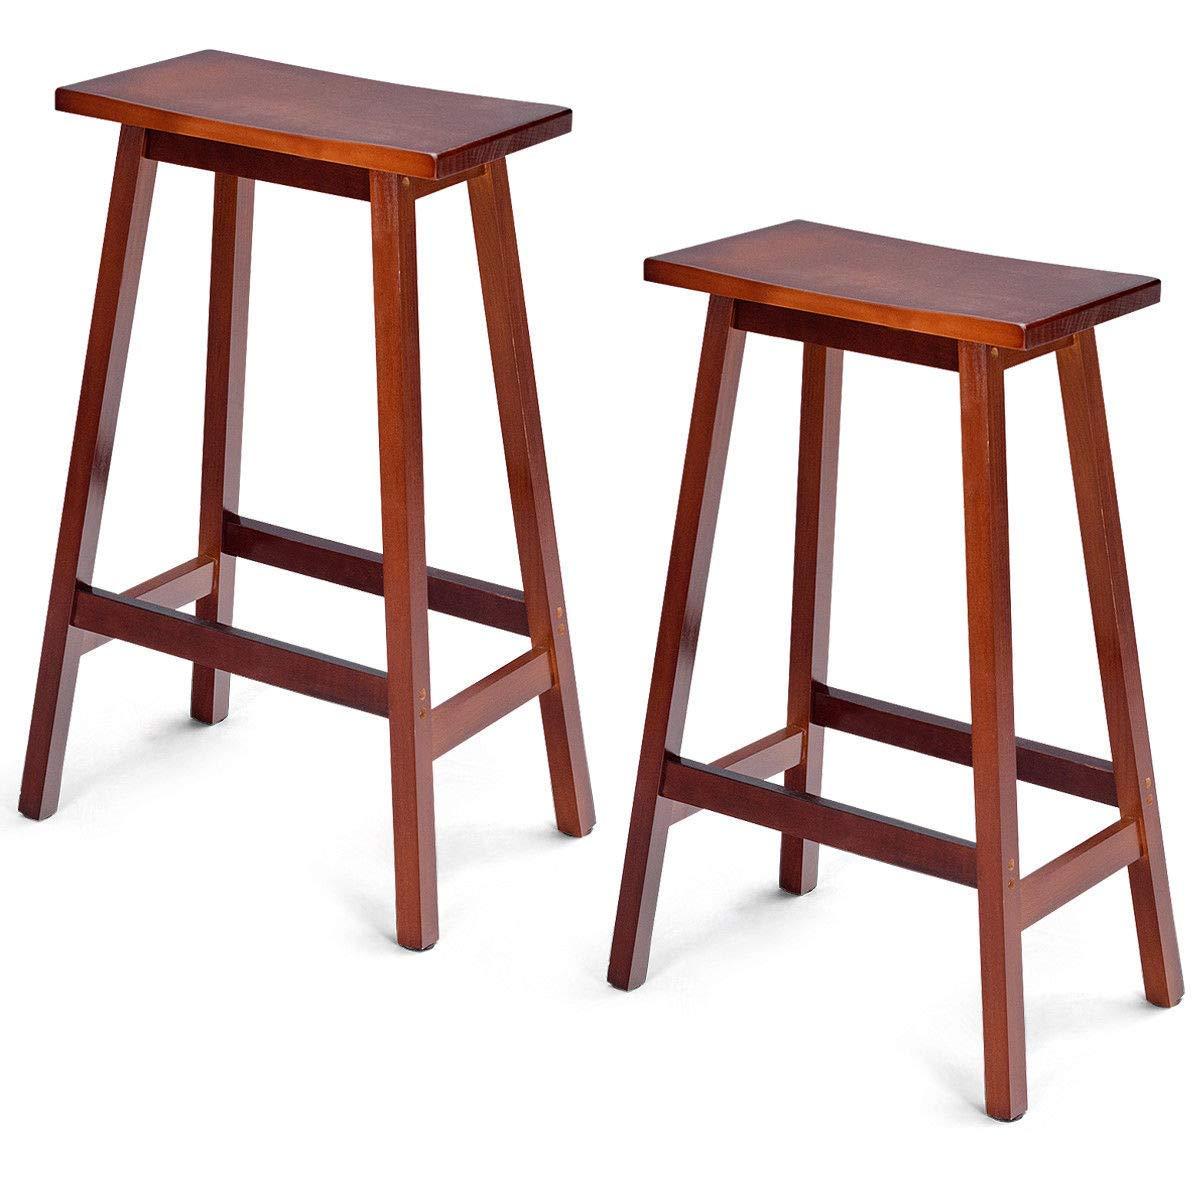 Cheap Wood Backless Bar Stools Find Wood Backless Bar Stools Deals On Line At Alibaba Com